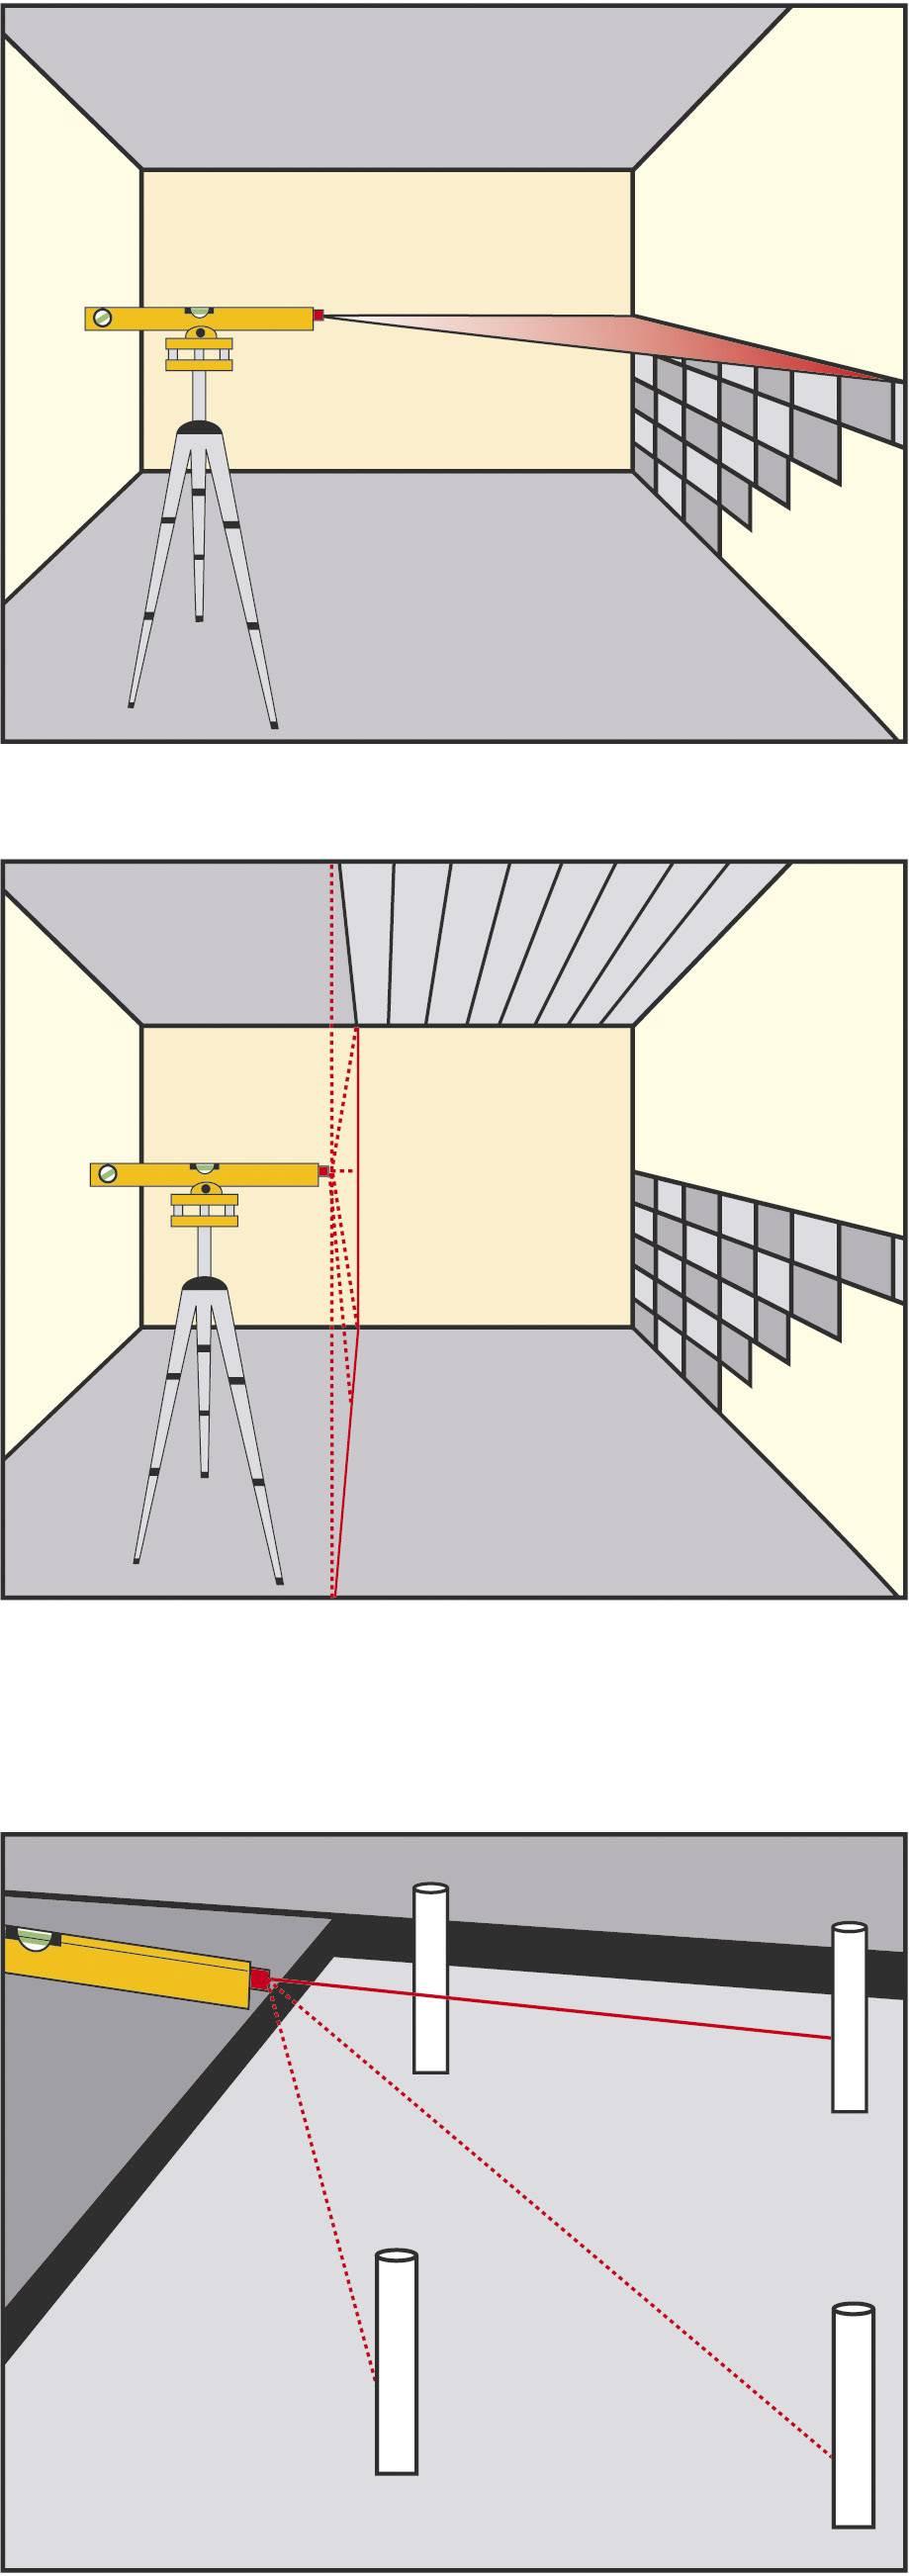 Laserová vodováha so statívom, Brüder Mannesmann 81110, merací rozsah 30 m